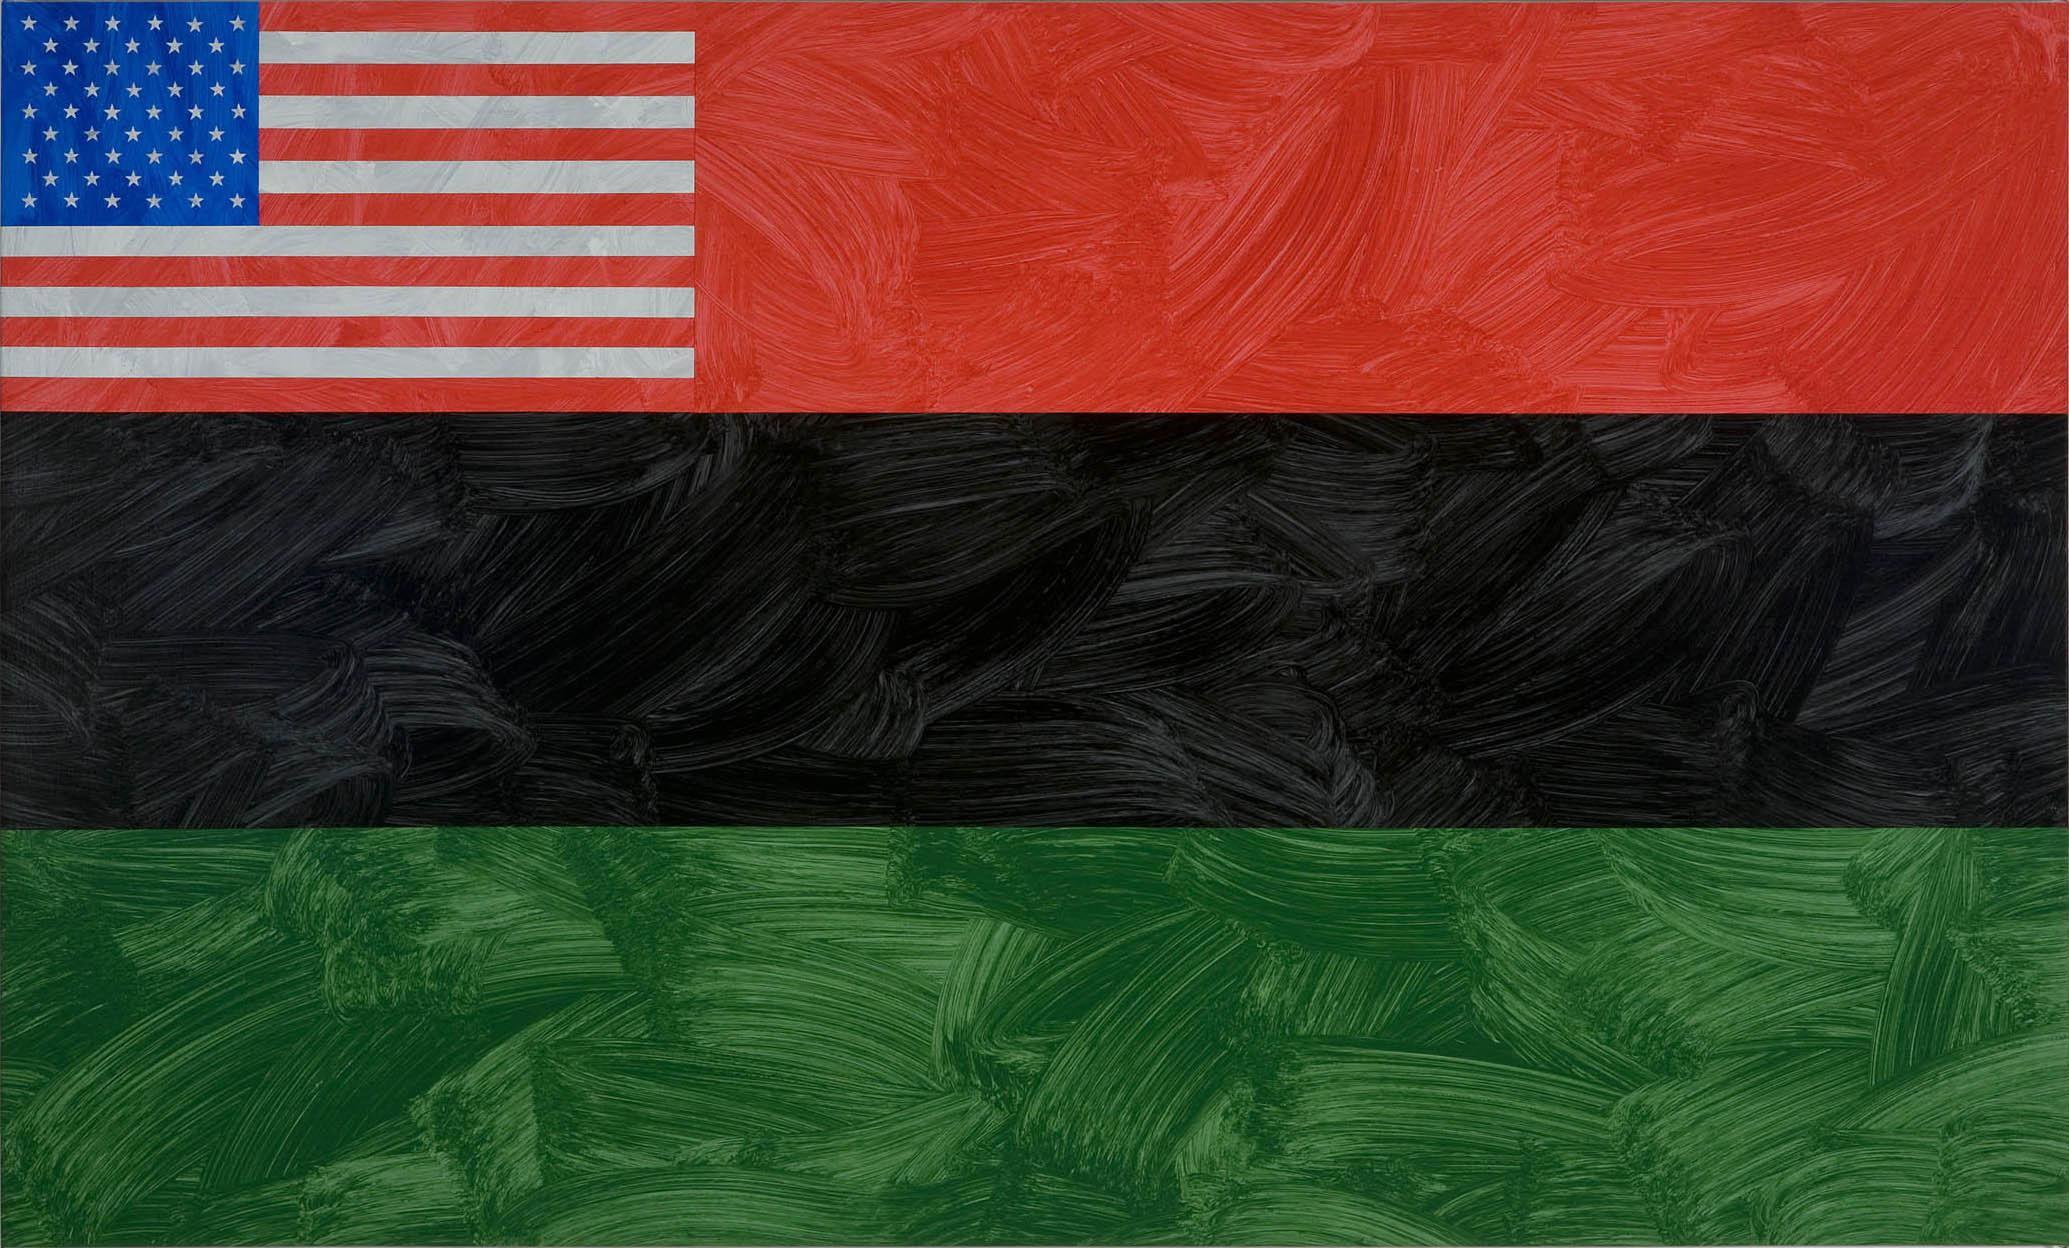 Louis Cameron | African-American Flag, 2009